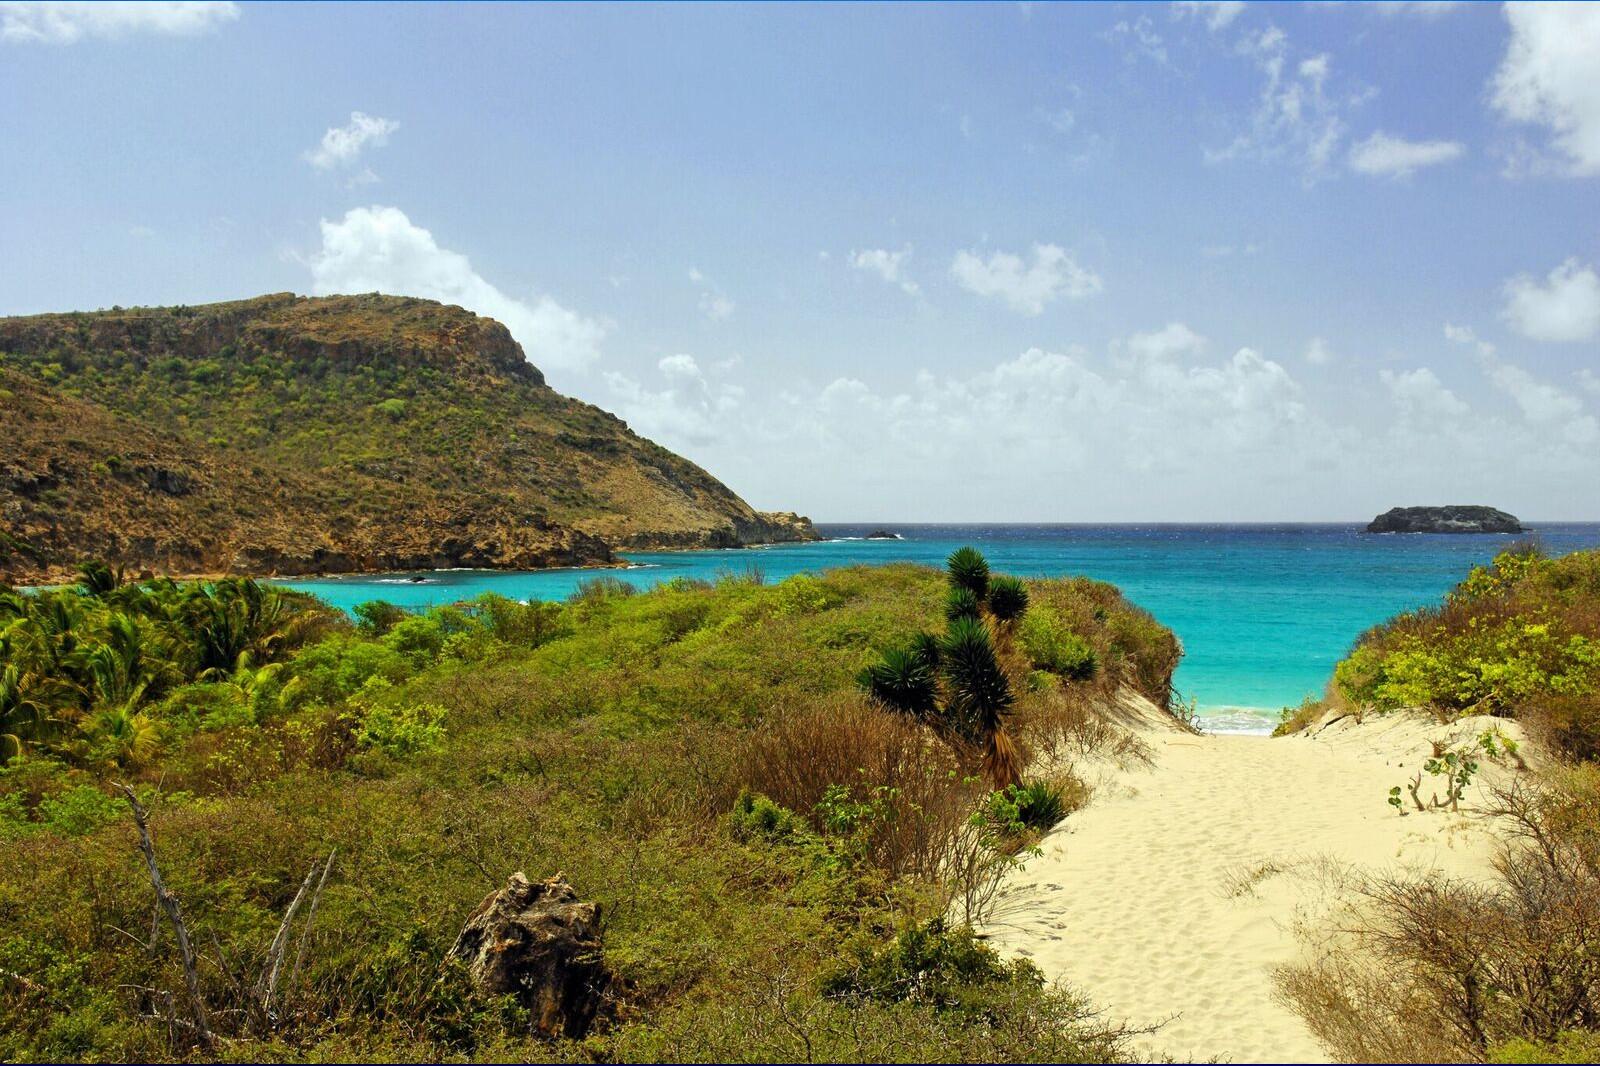 wild beaches in Saint Barts